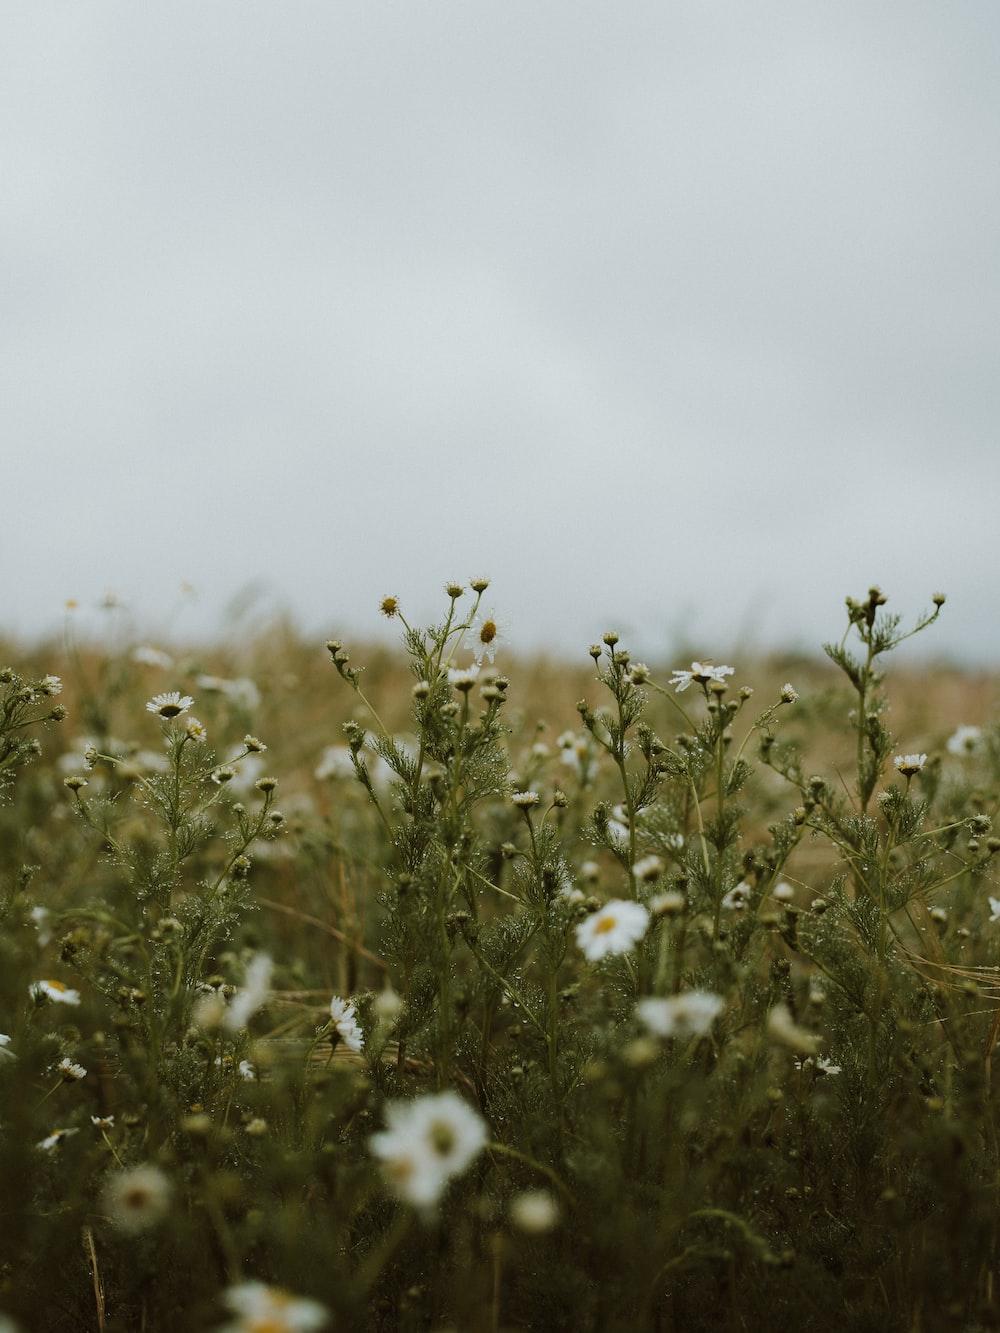 white flower field during daytime